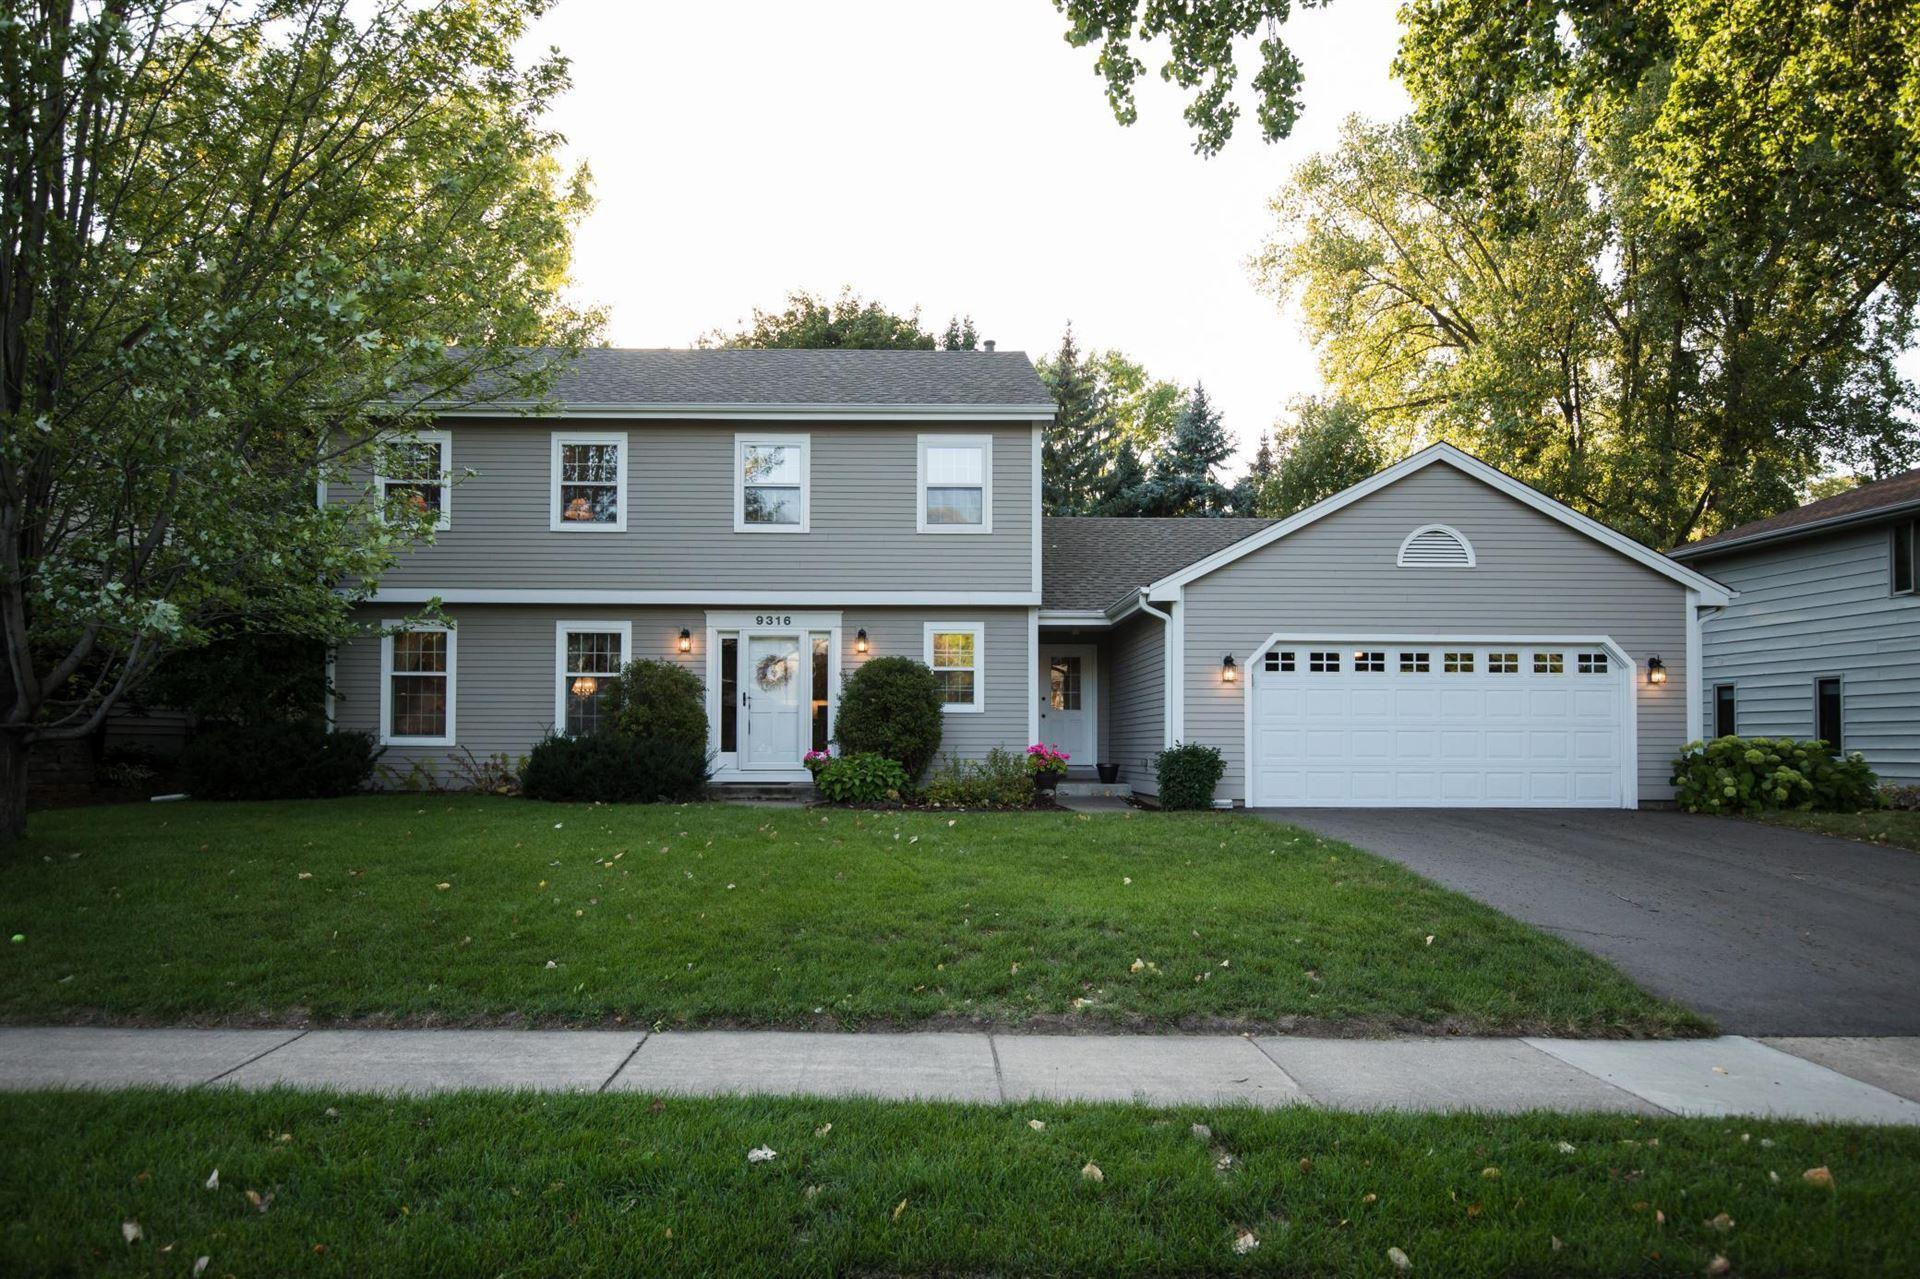 Photo of 9316 Rich Road, Bloomington, MN 55437 (MLS # 6103051)